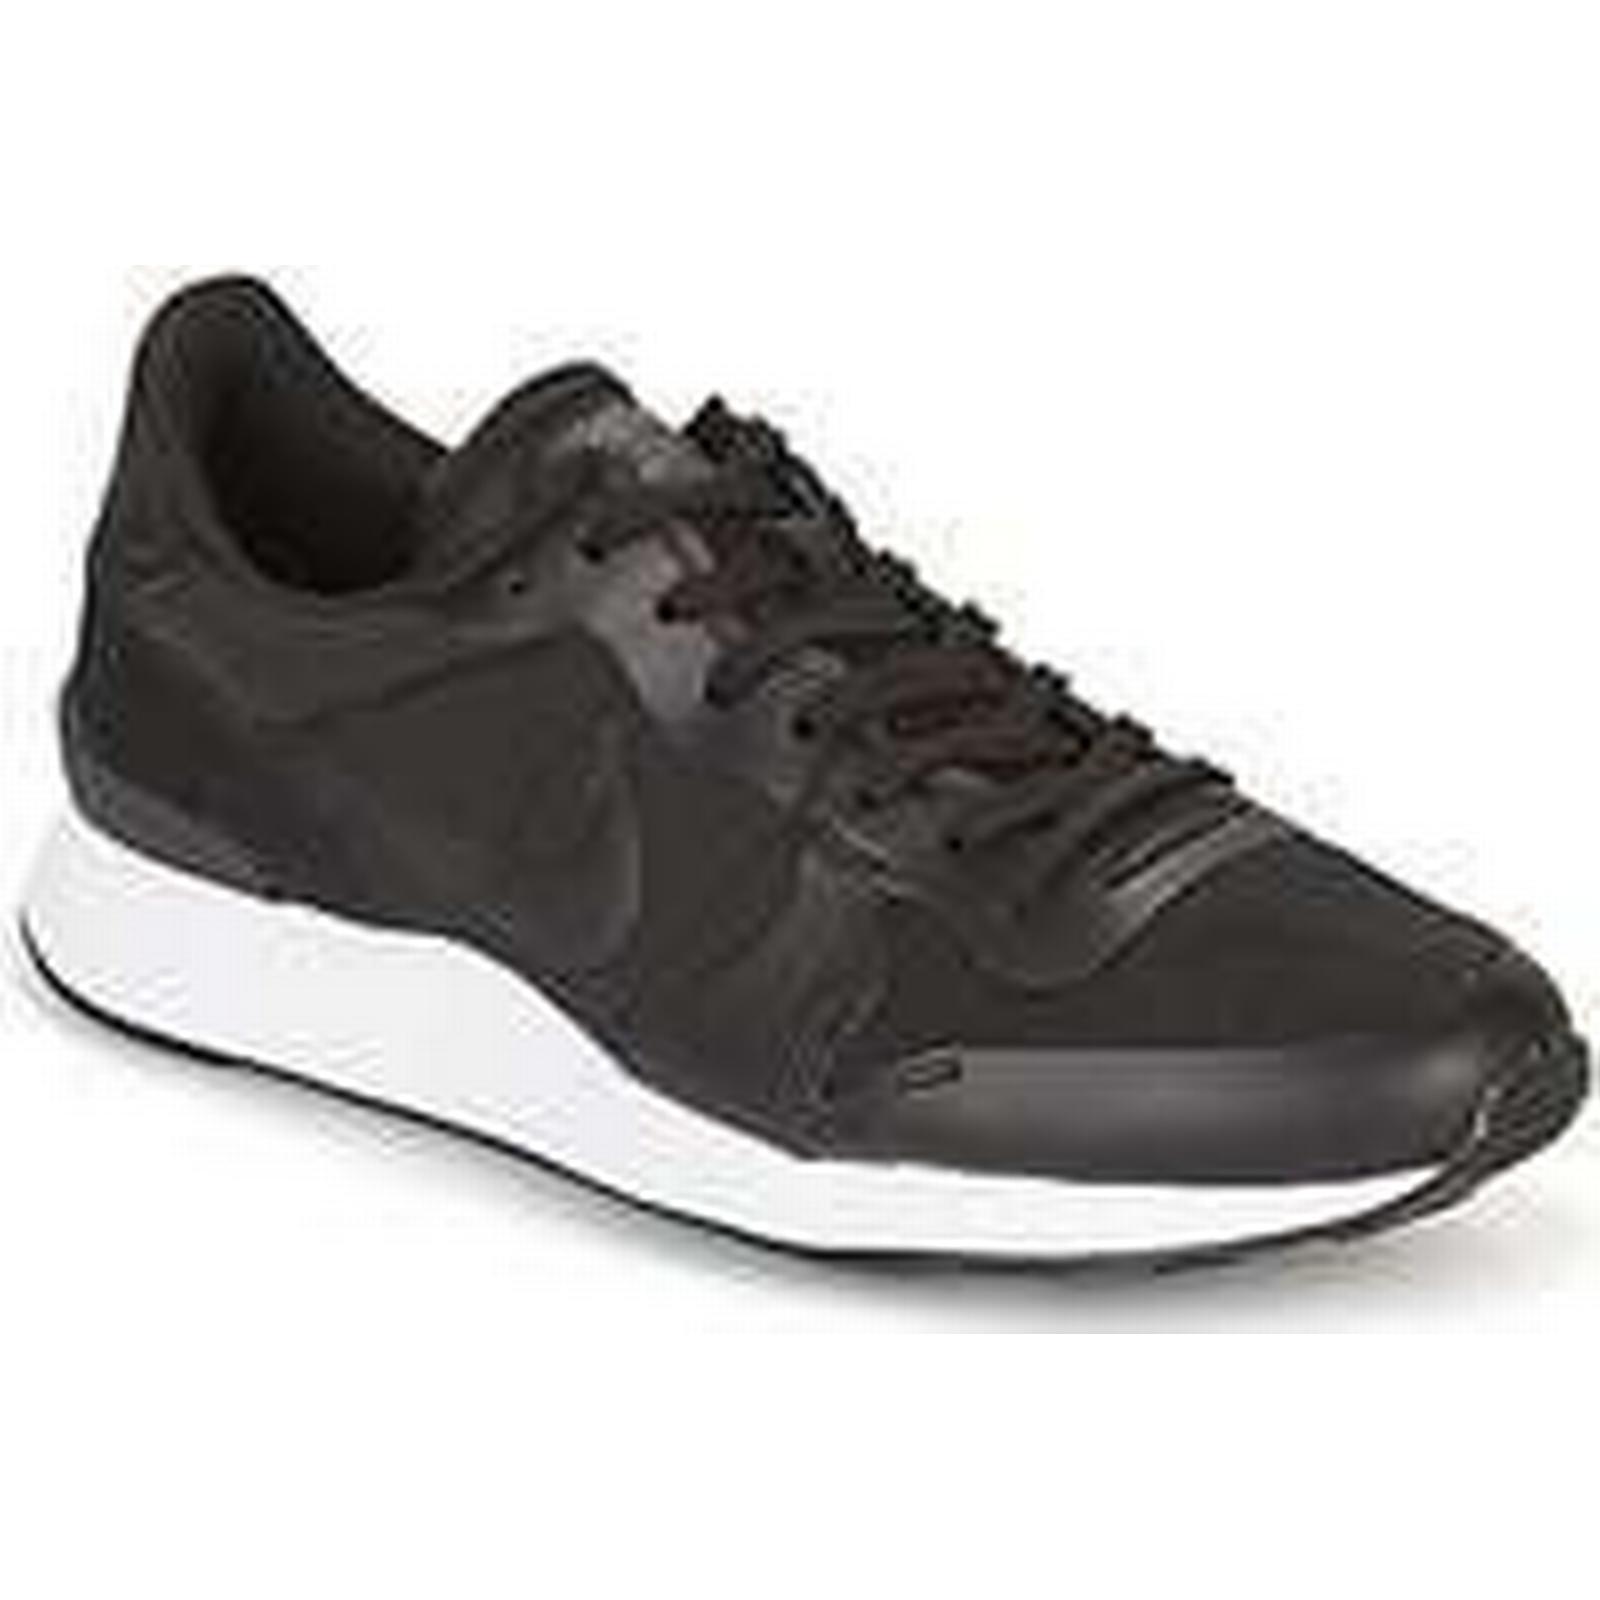 Spartoo.co.uk men's Nike INTERNATIONALIST LT17 men's Spartoo.co.uk Shoes (Trainers) in Black 35b7dd